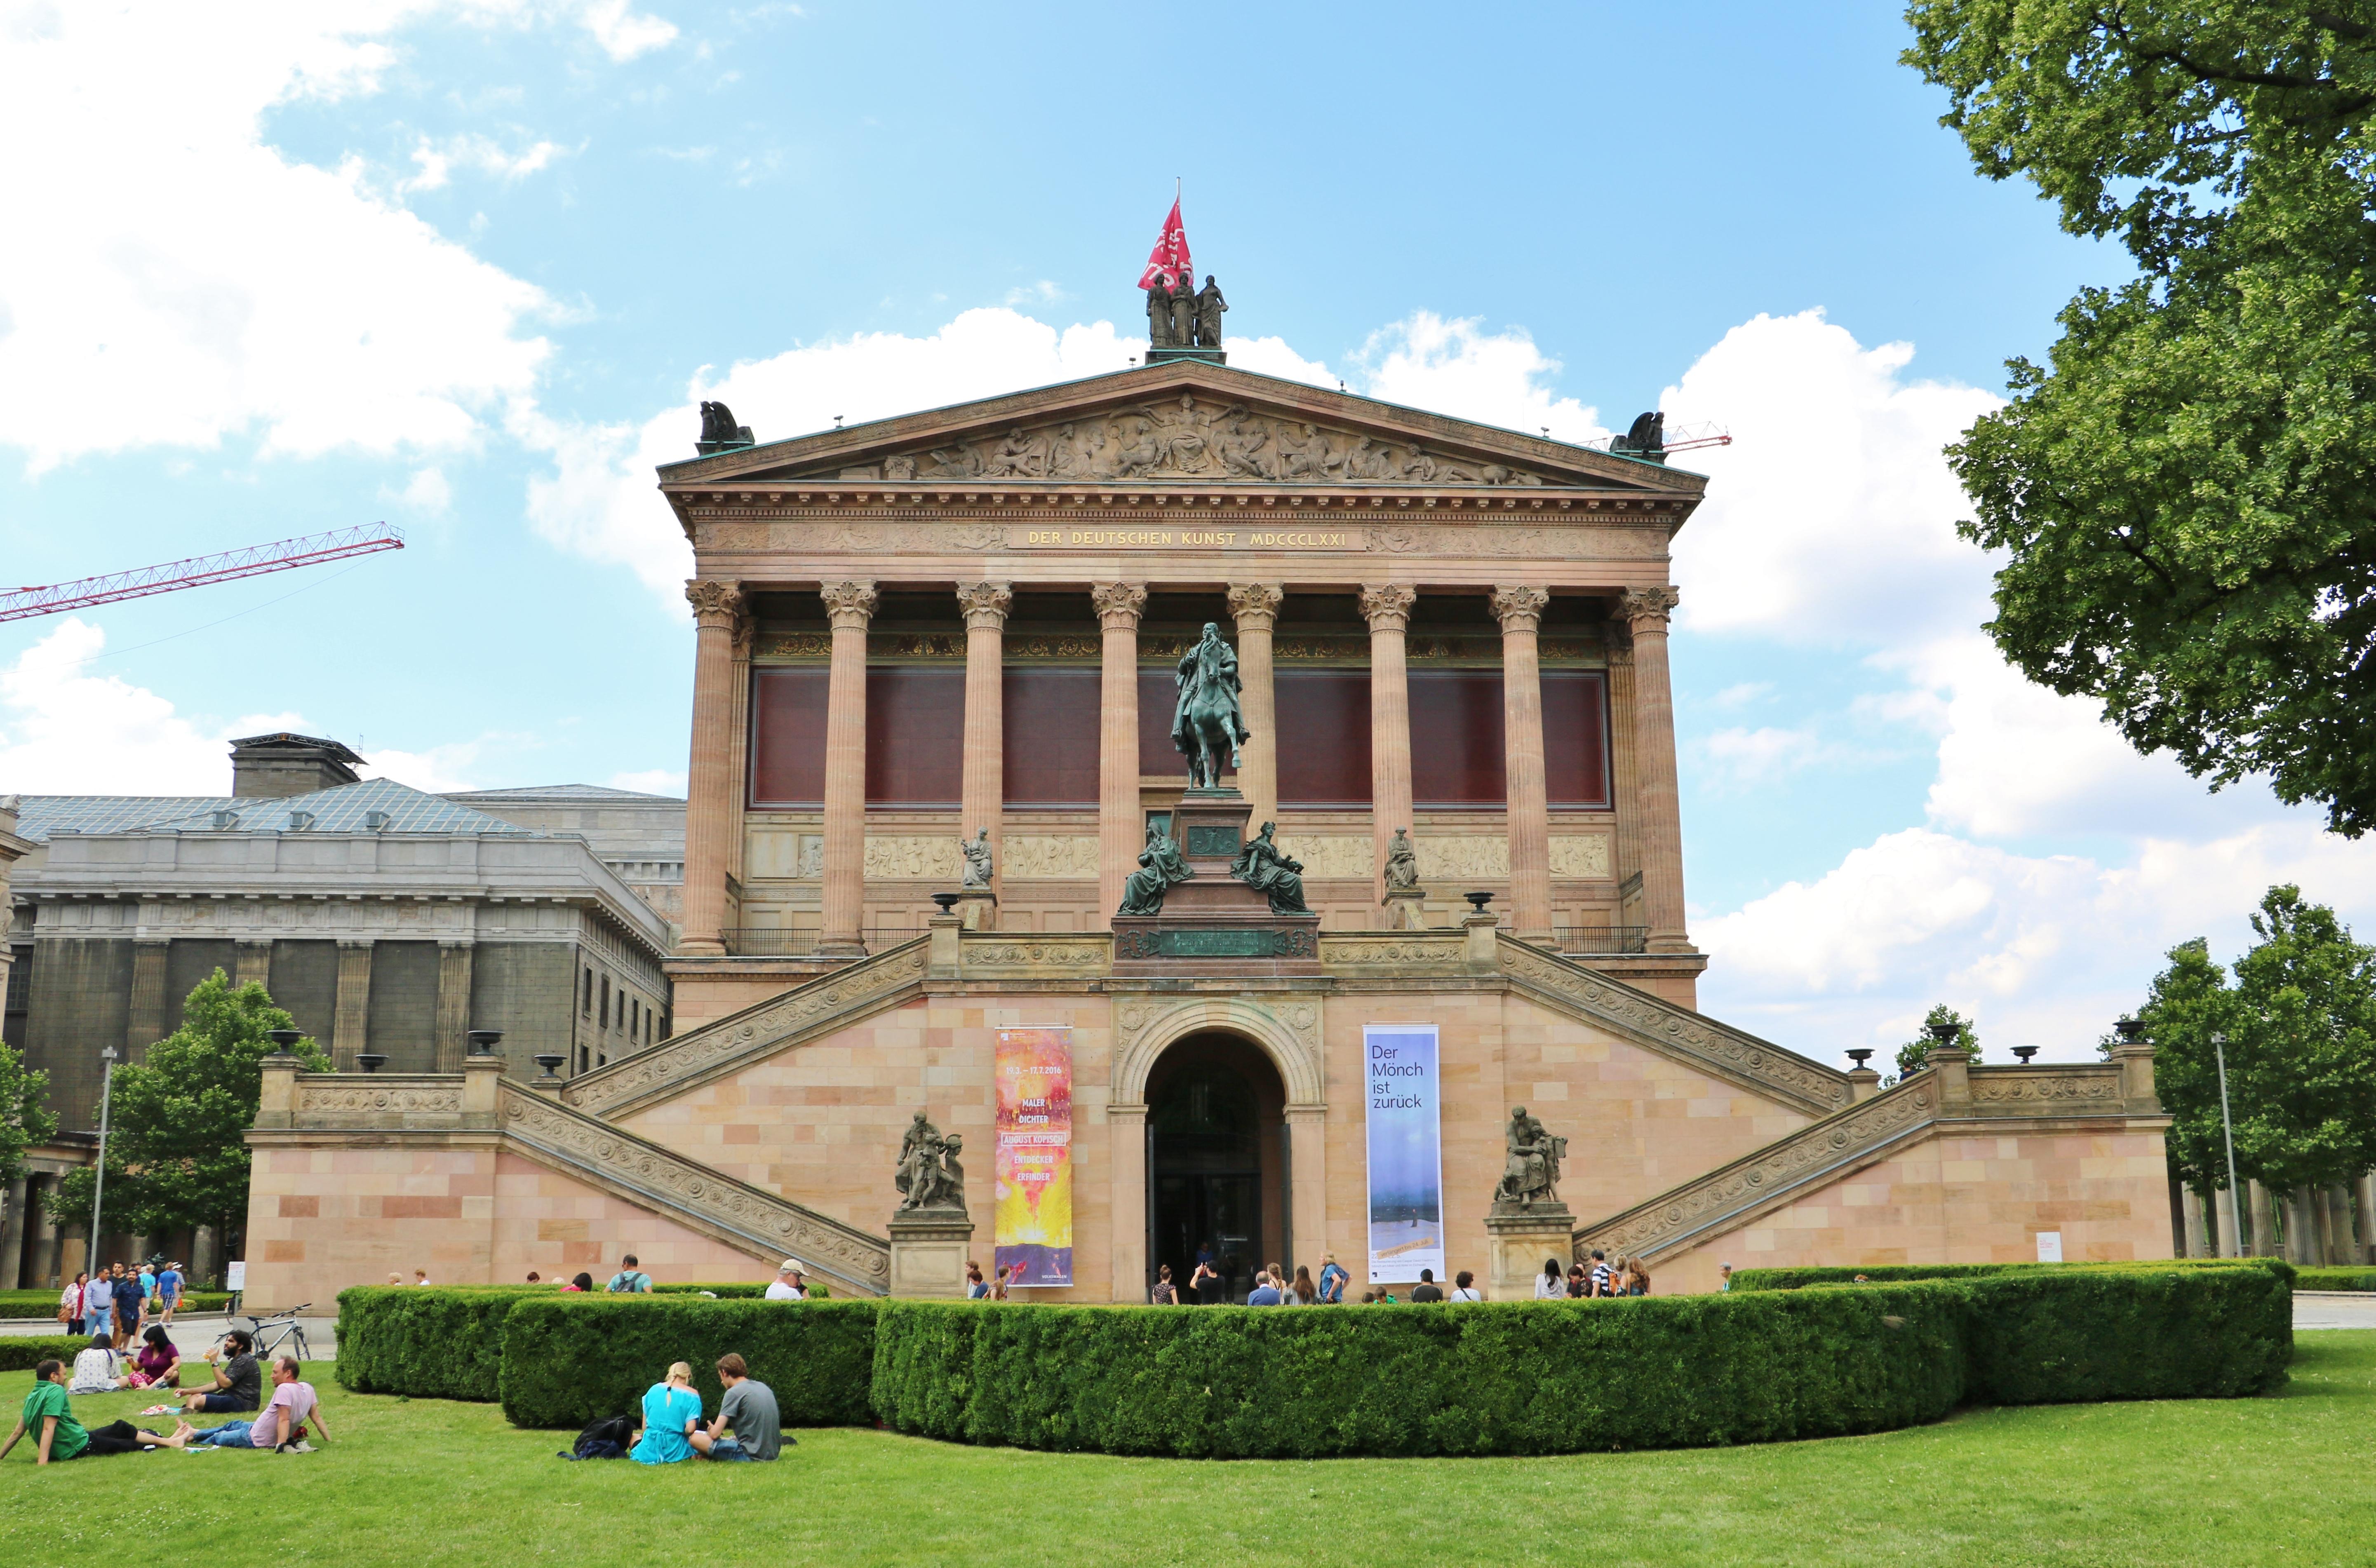 柏林国立美术馆  The National Gallery in Berlin   -0